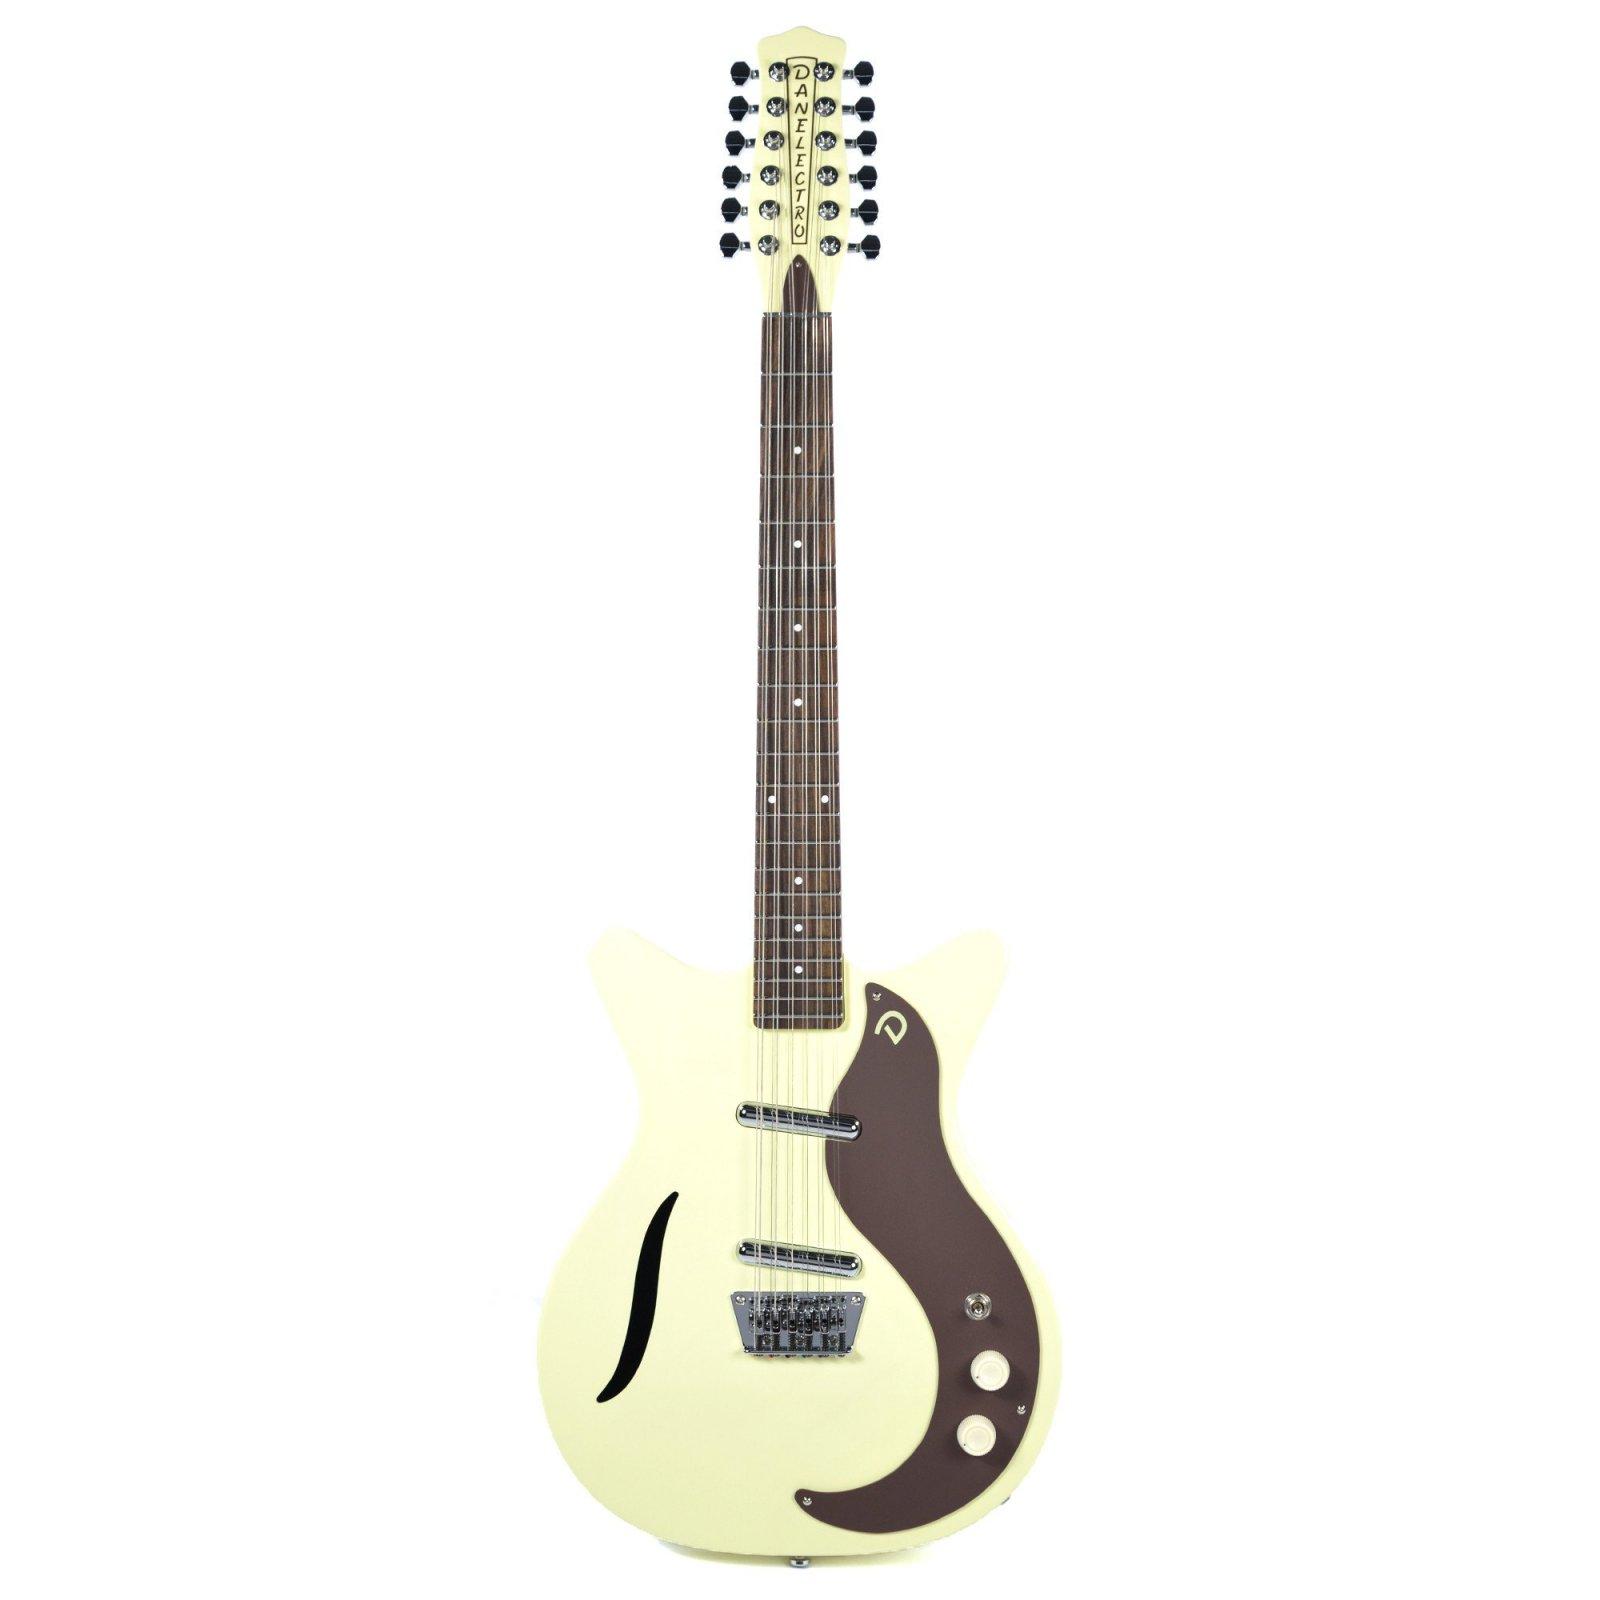 Danelectro '59 Vintage 12-String Electric Guitar - Vintage White